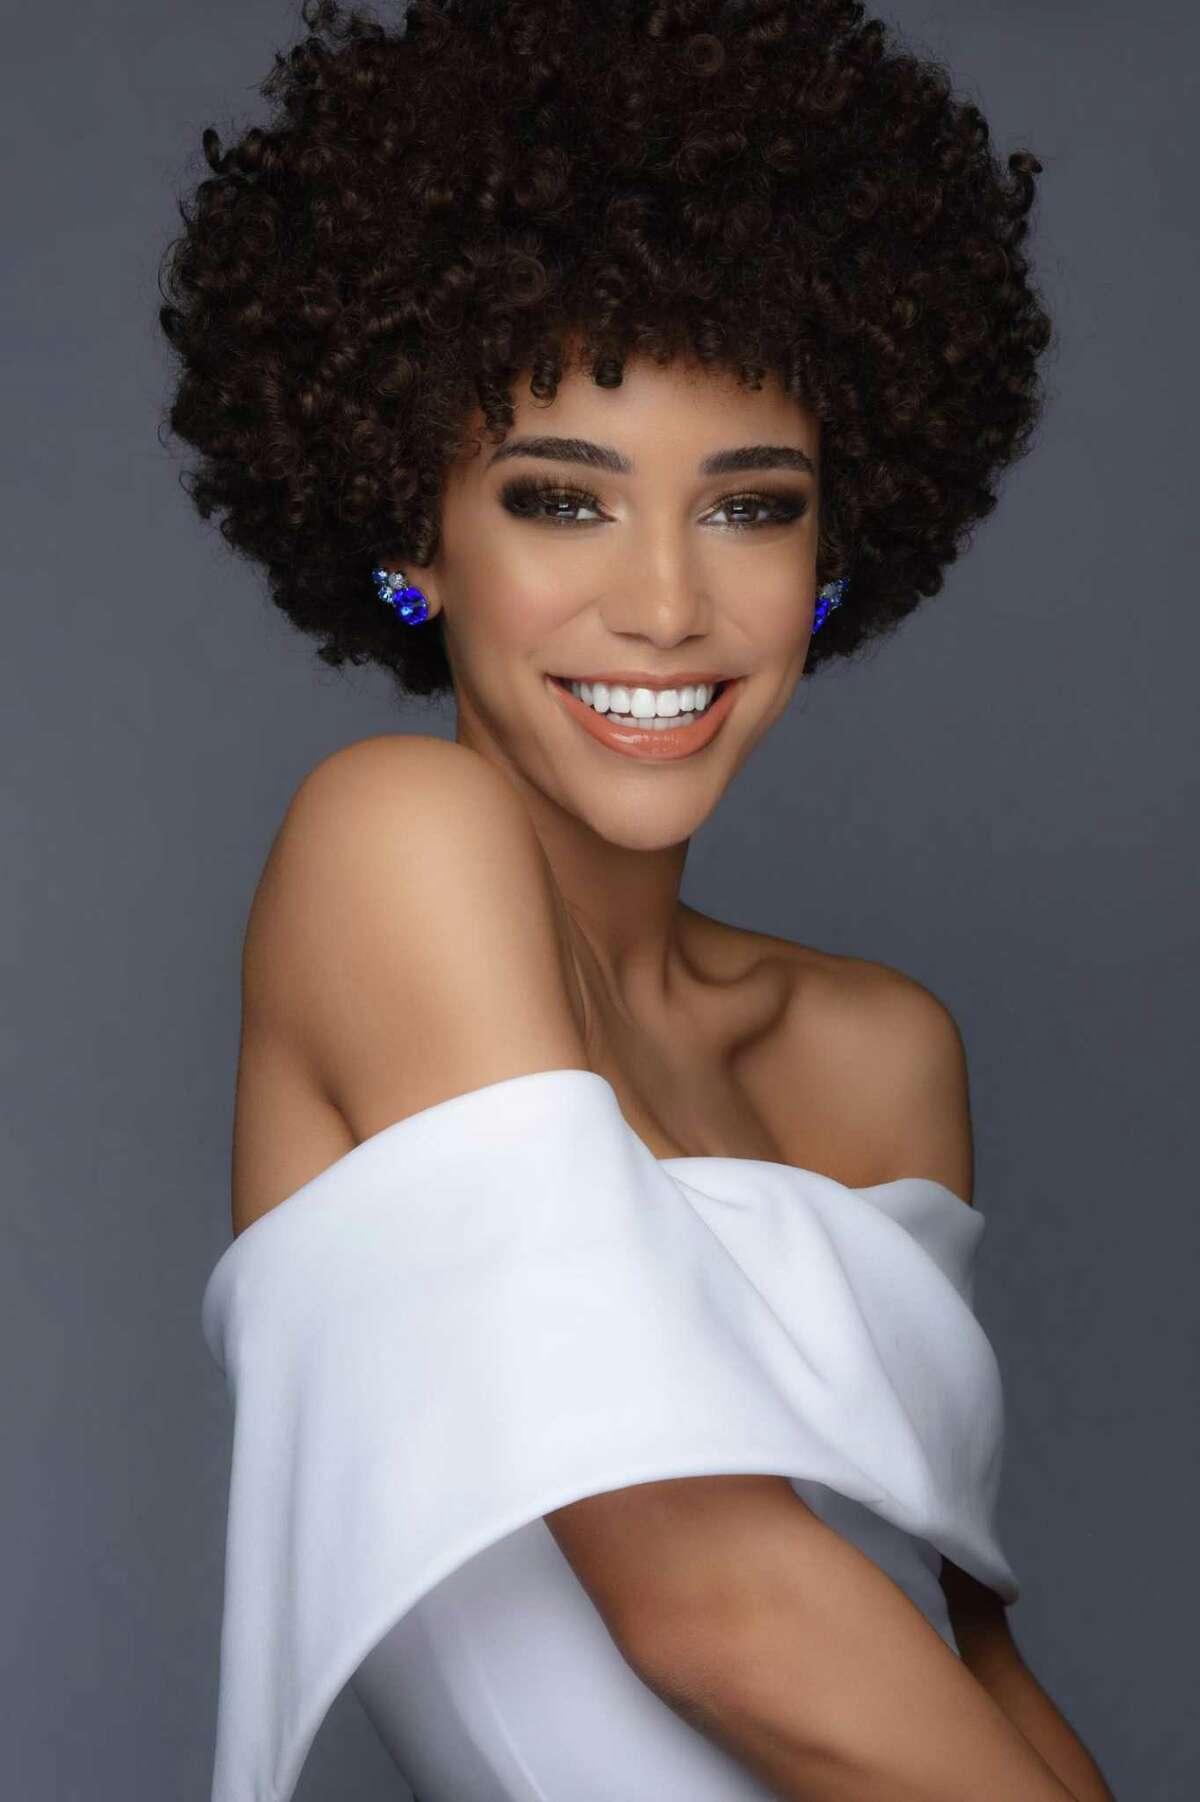 Kaleigh Garris, 18 of Milford, was named 2019 Miss Teen USA.